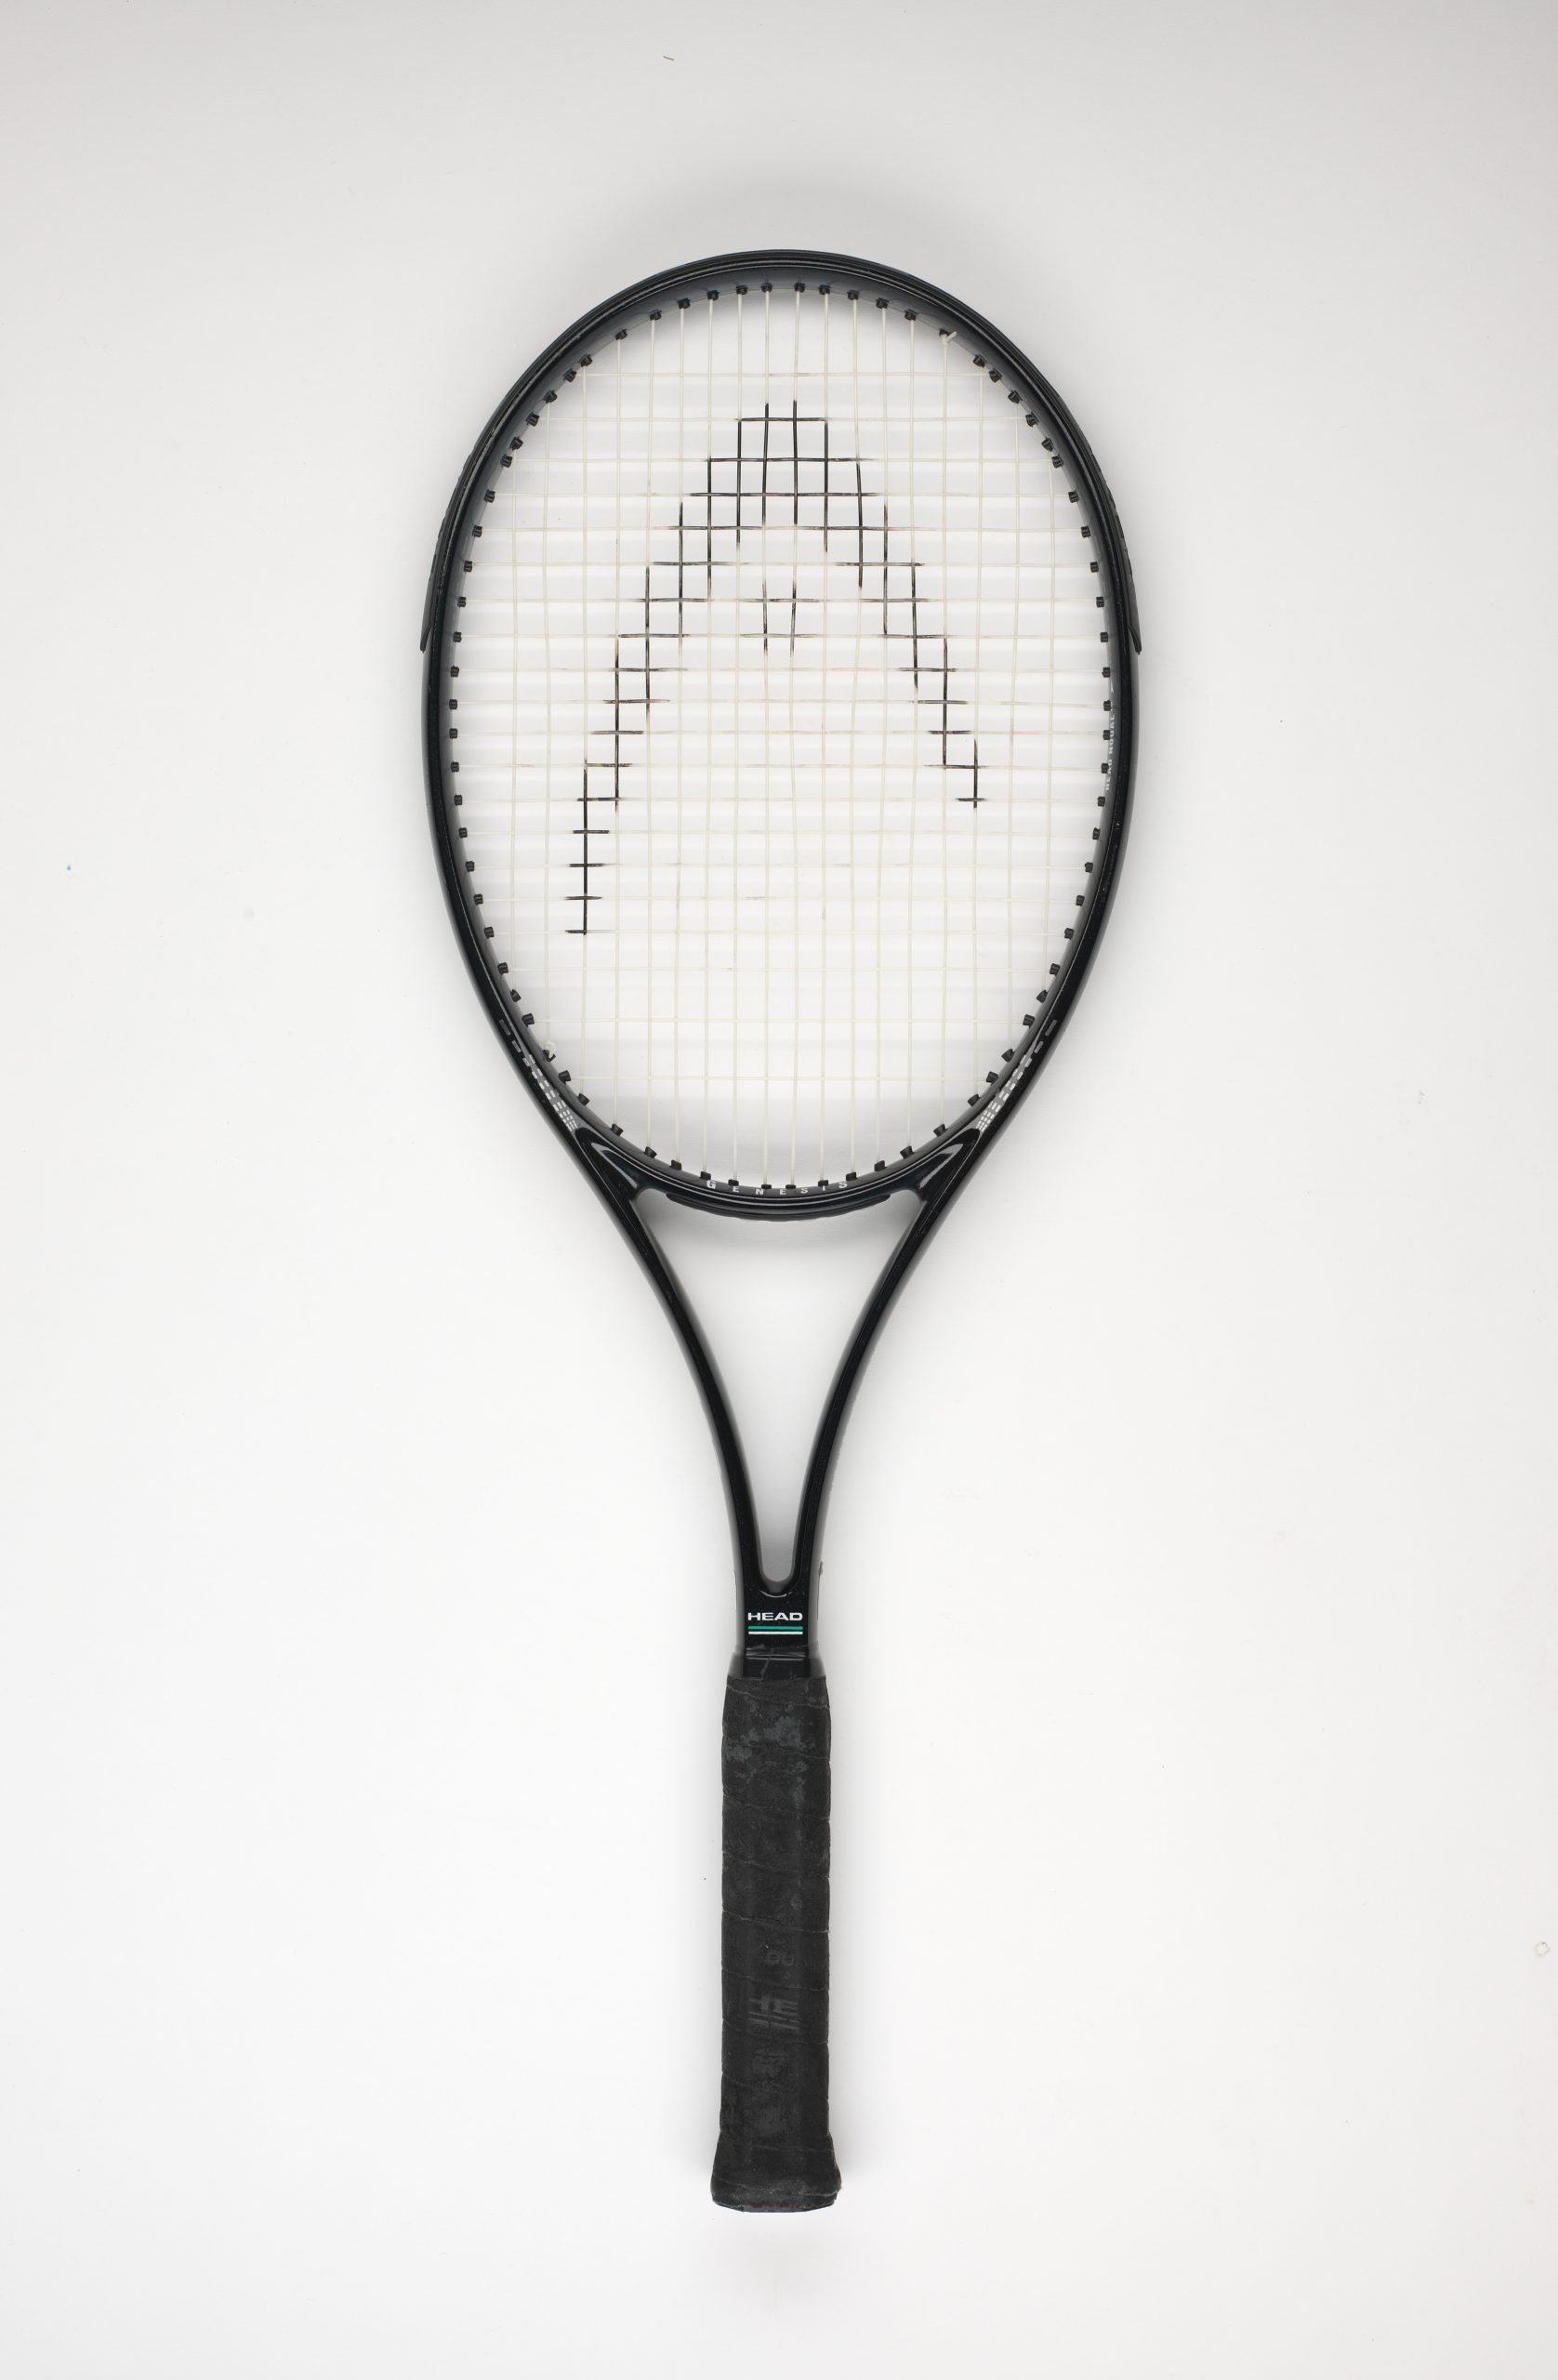 Arthur Ashe's Tennis Racket